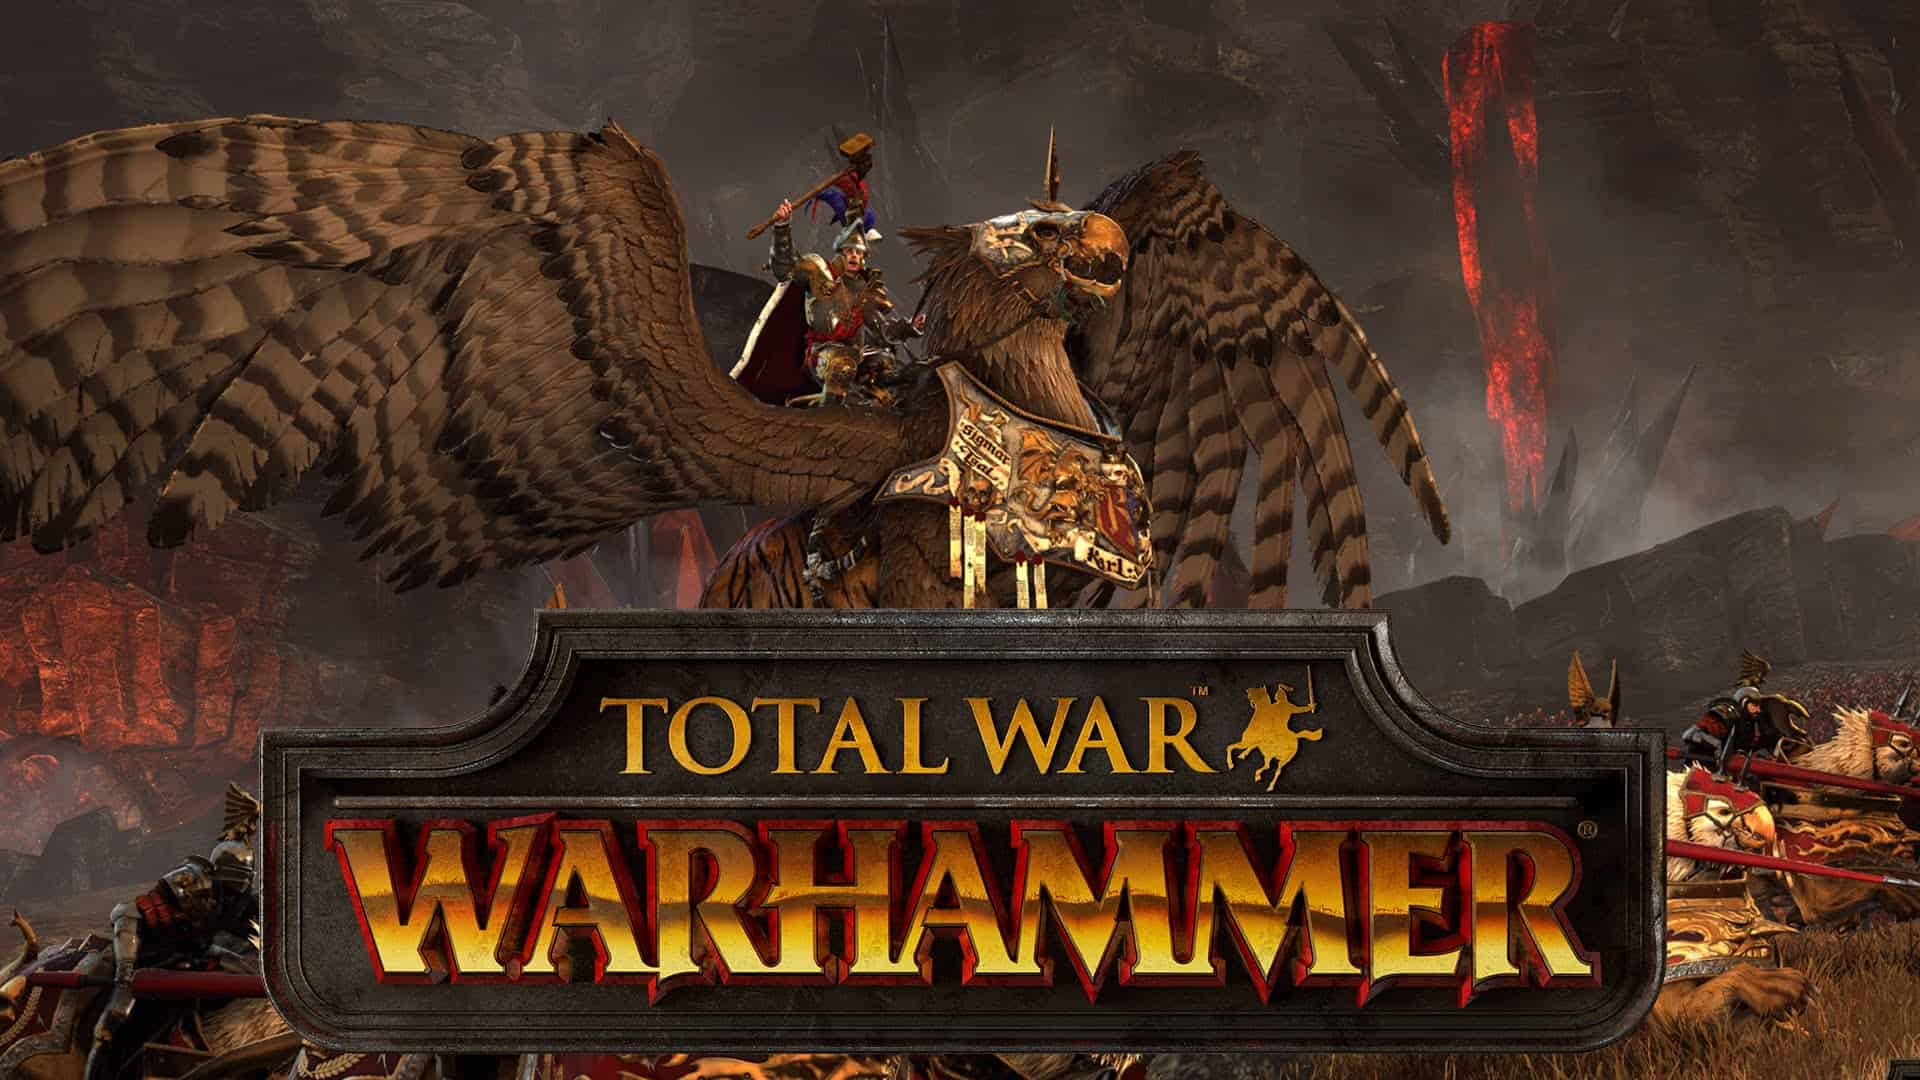 TotalWar Warhammer